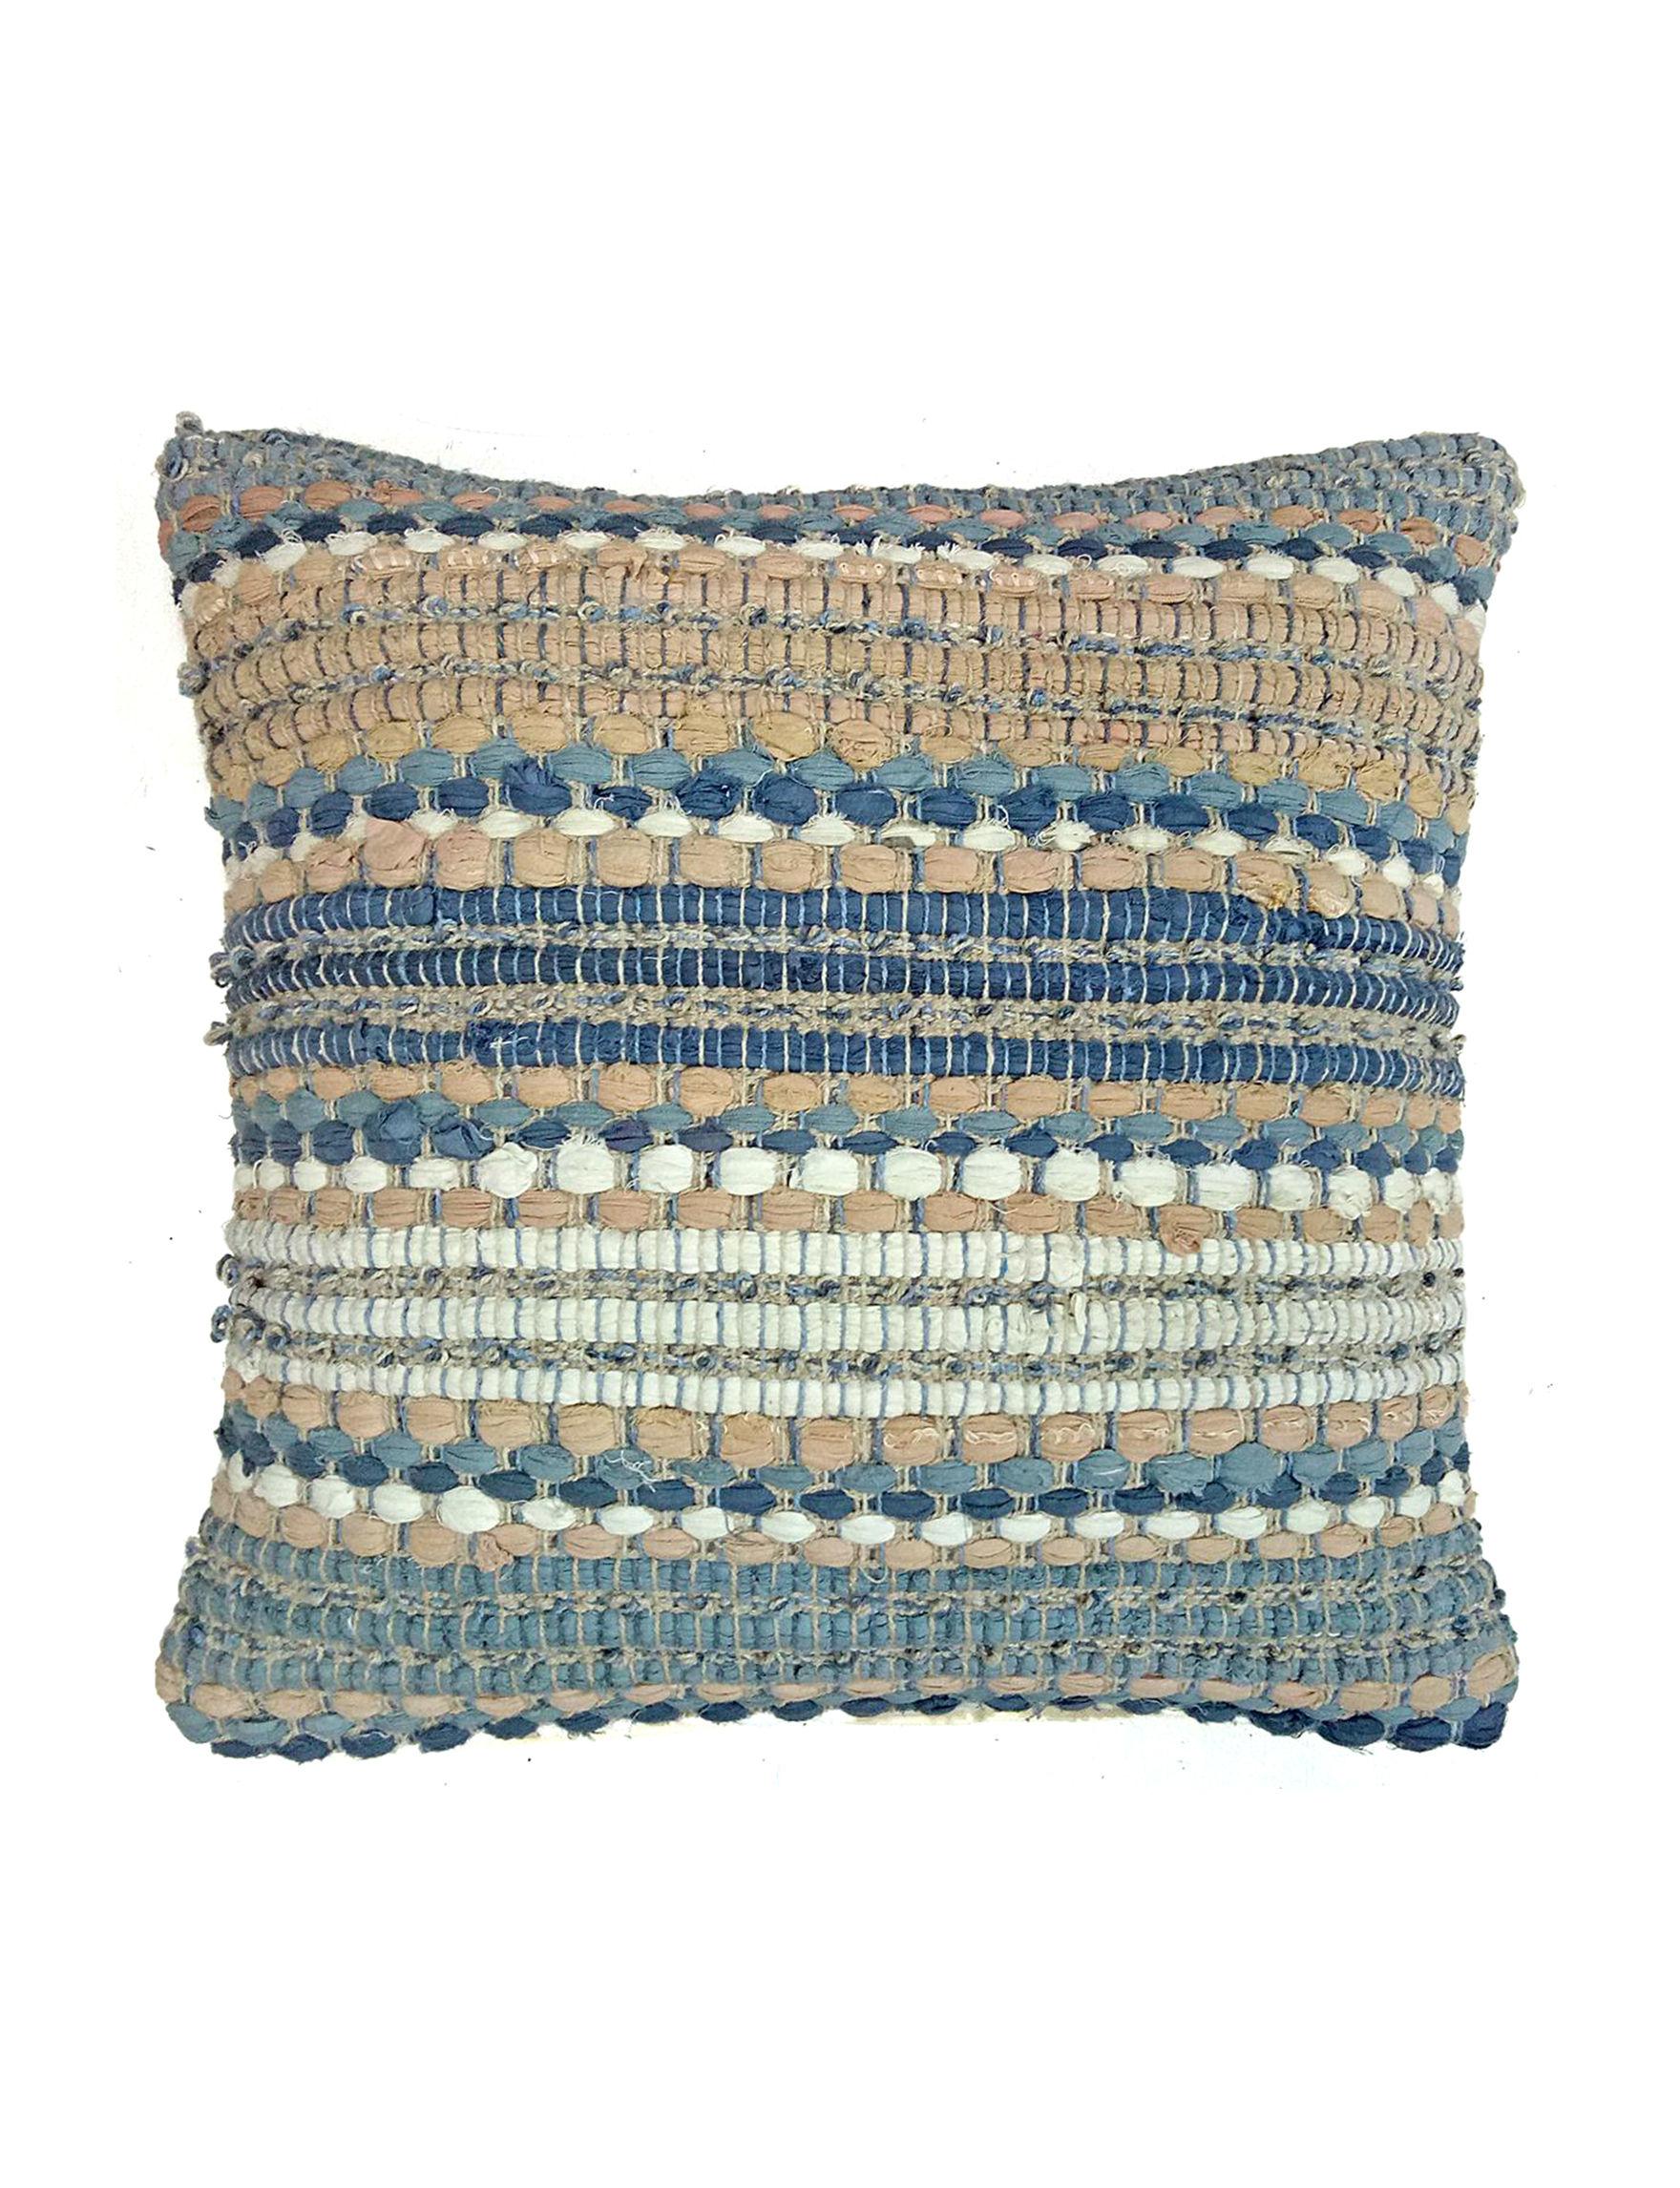 Birchwood Dark Blue Decorative Pillows